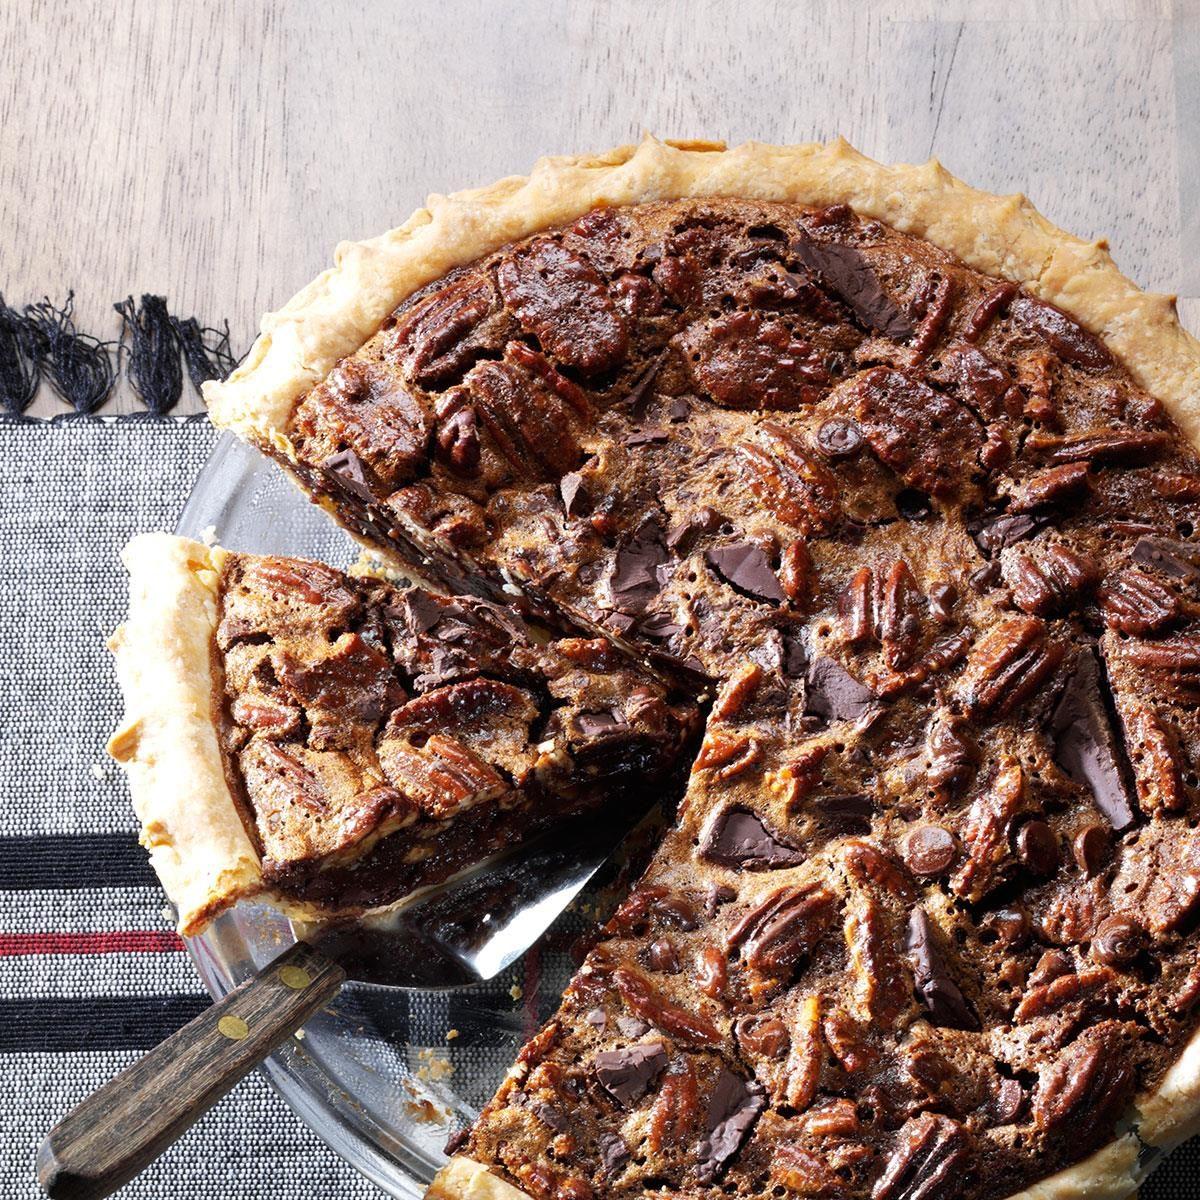 Chocolate Chunk Pecan Pie photo